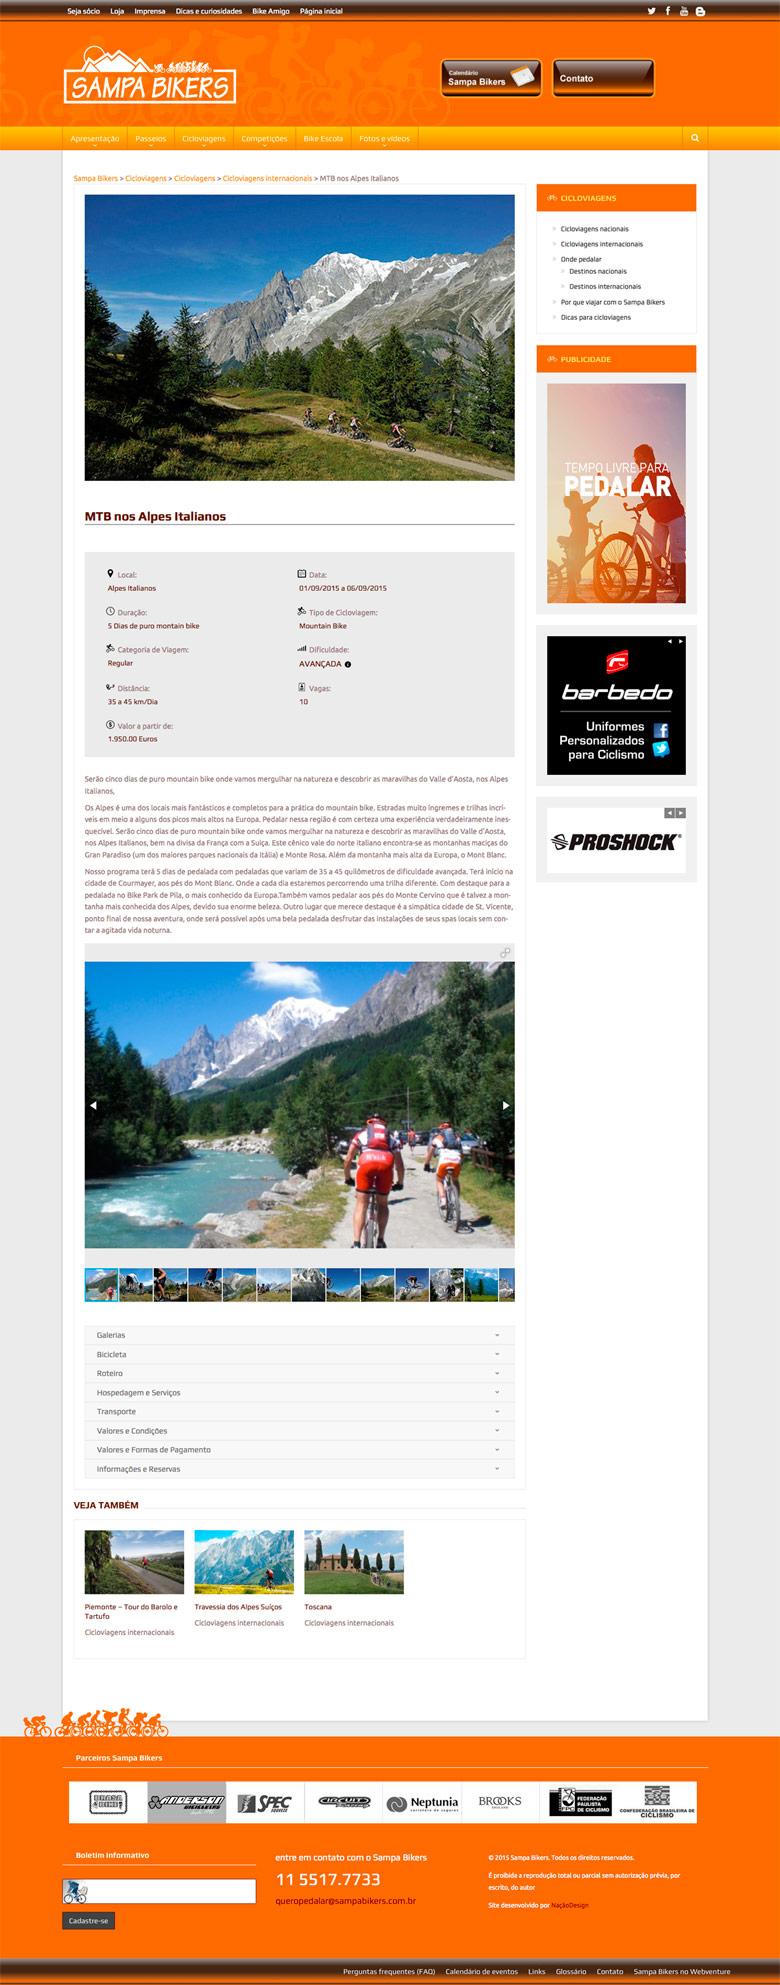 pagina-interna-sampa-bikers